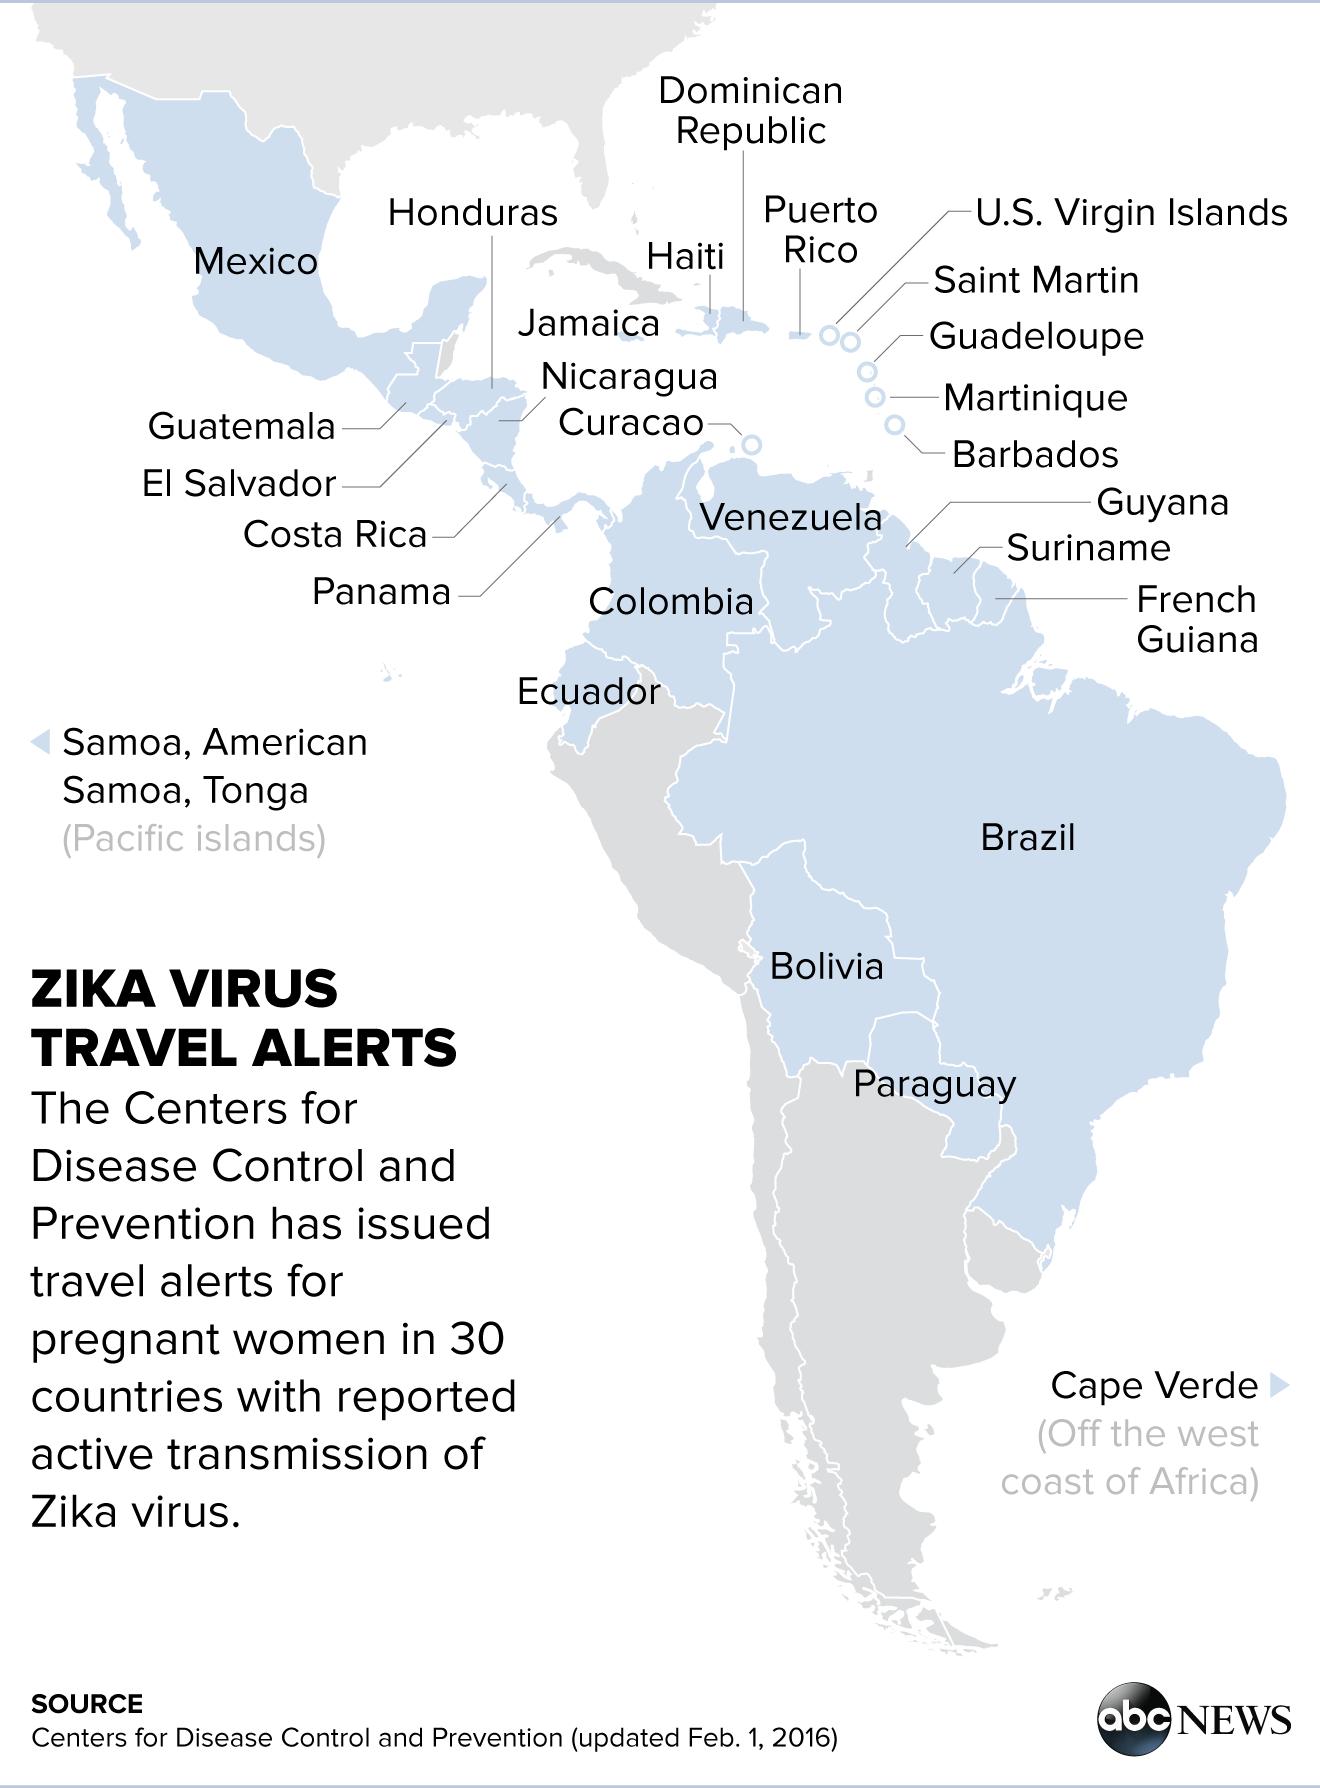 Zika Virus Outbreak Updates China Reports First Case ABC News - Us virus map